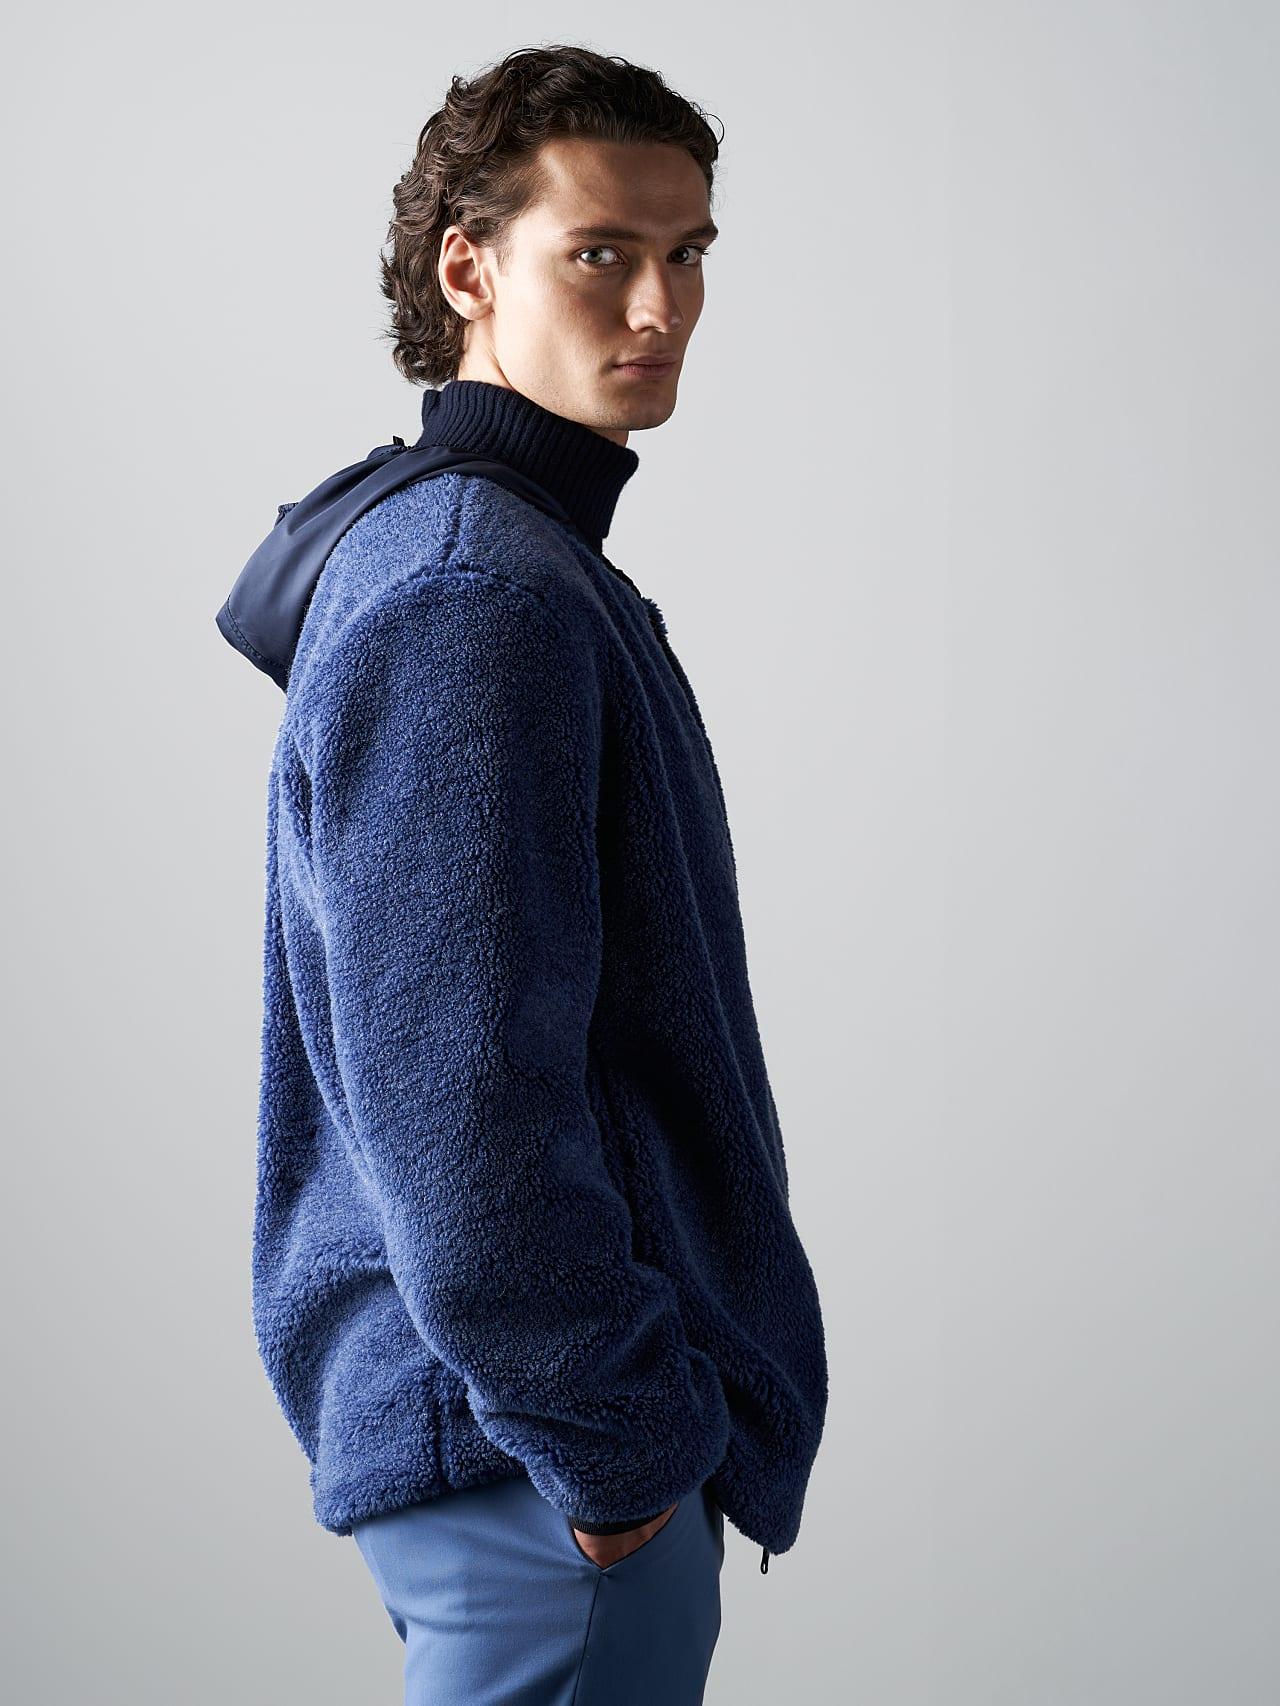 OVEDY V1.Y5.02 Reversible Wool-Blend Teddy Jacket light blue Extra Alpha Tauri